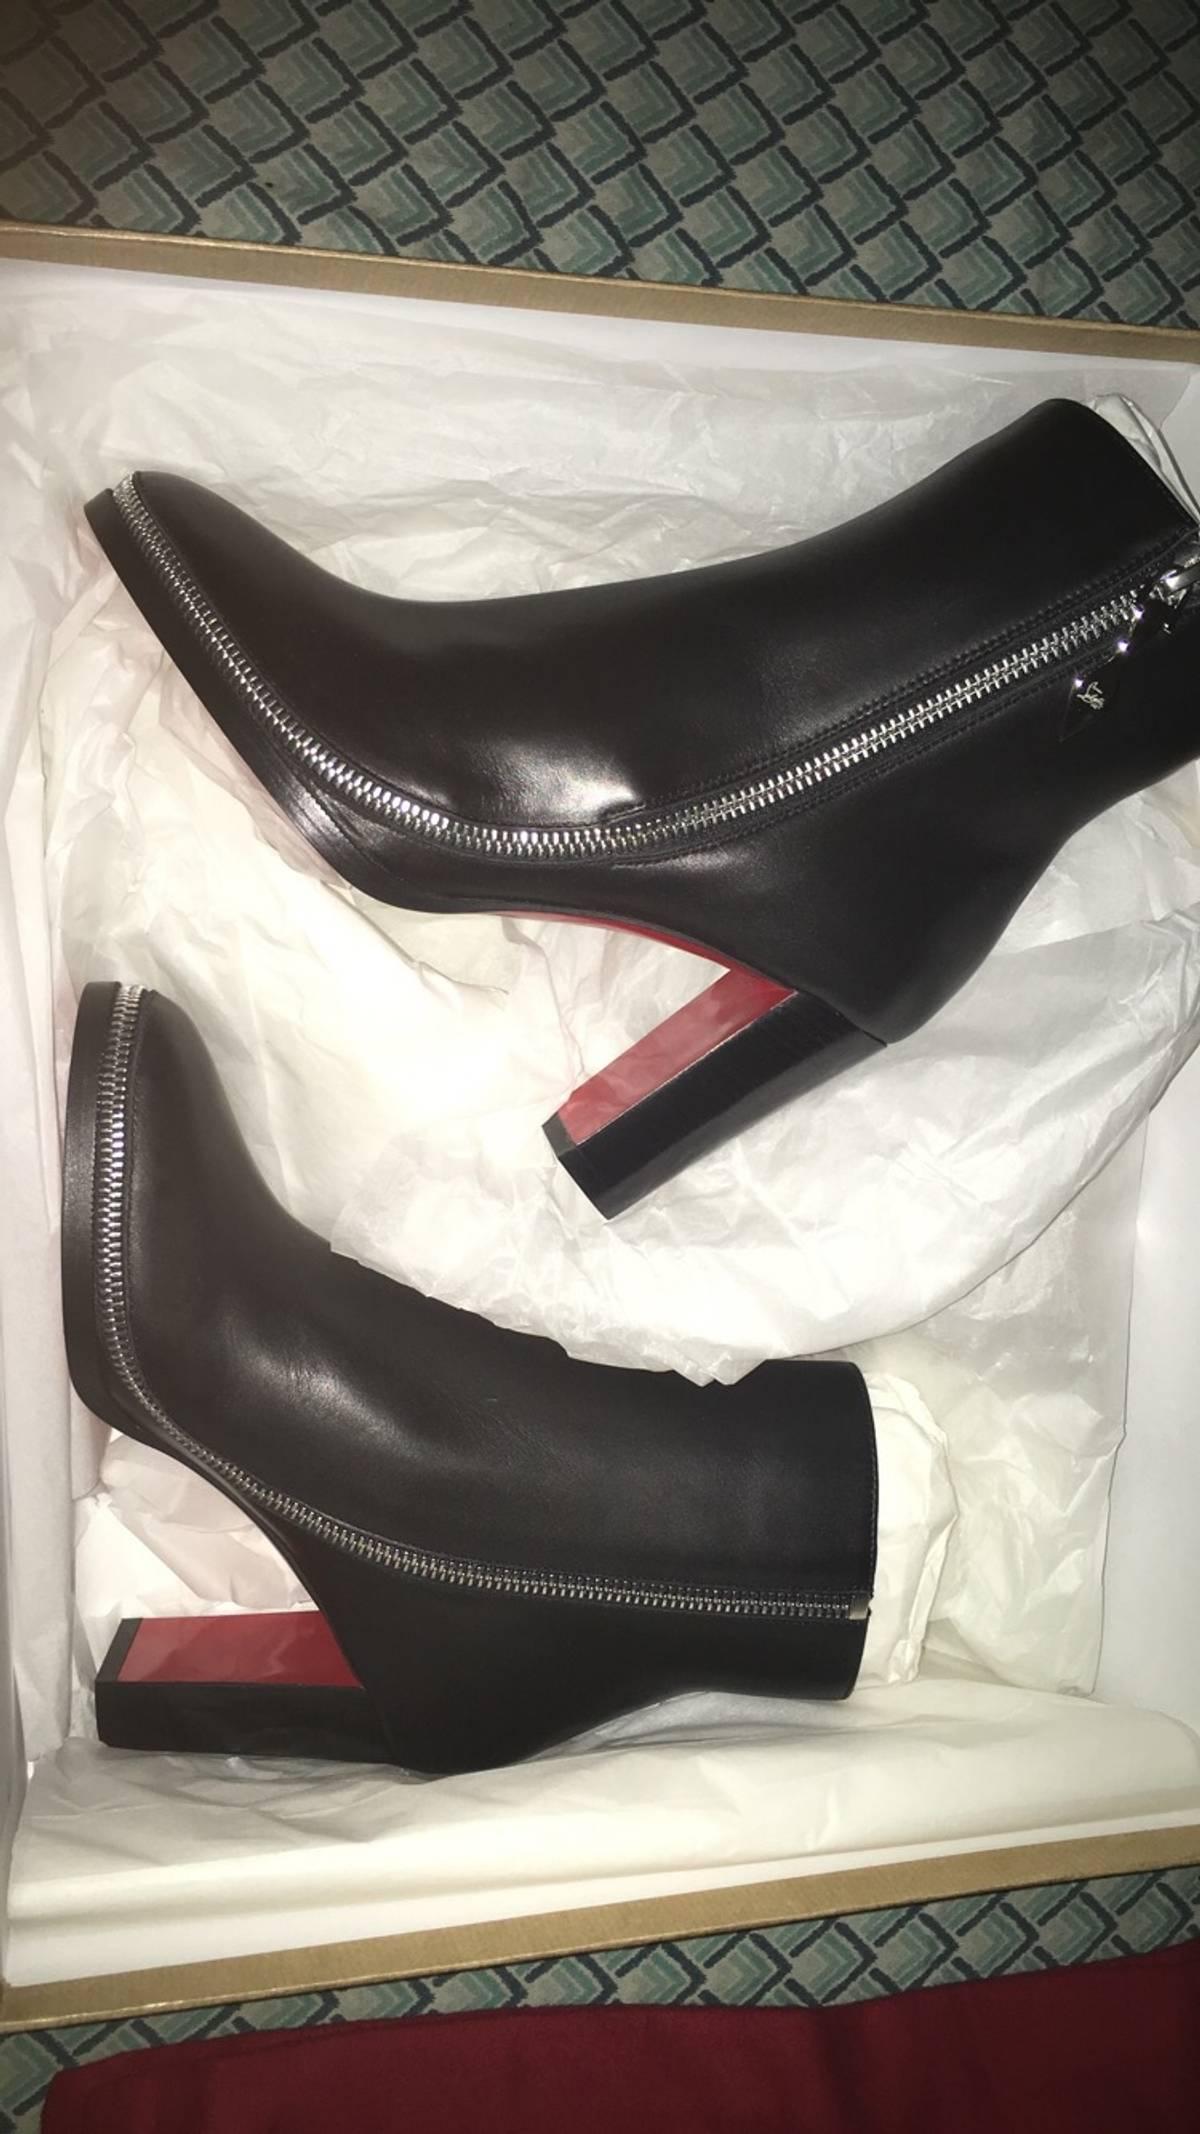 new arrival ae43b 91f43 Christian Louboutin Women's Telezip 85 Calf/ Cuoio Heel Size 6 $477